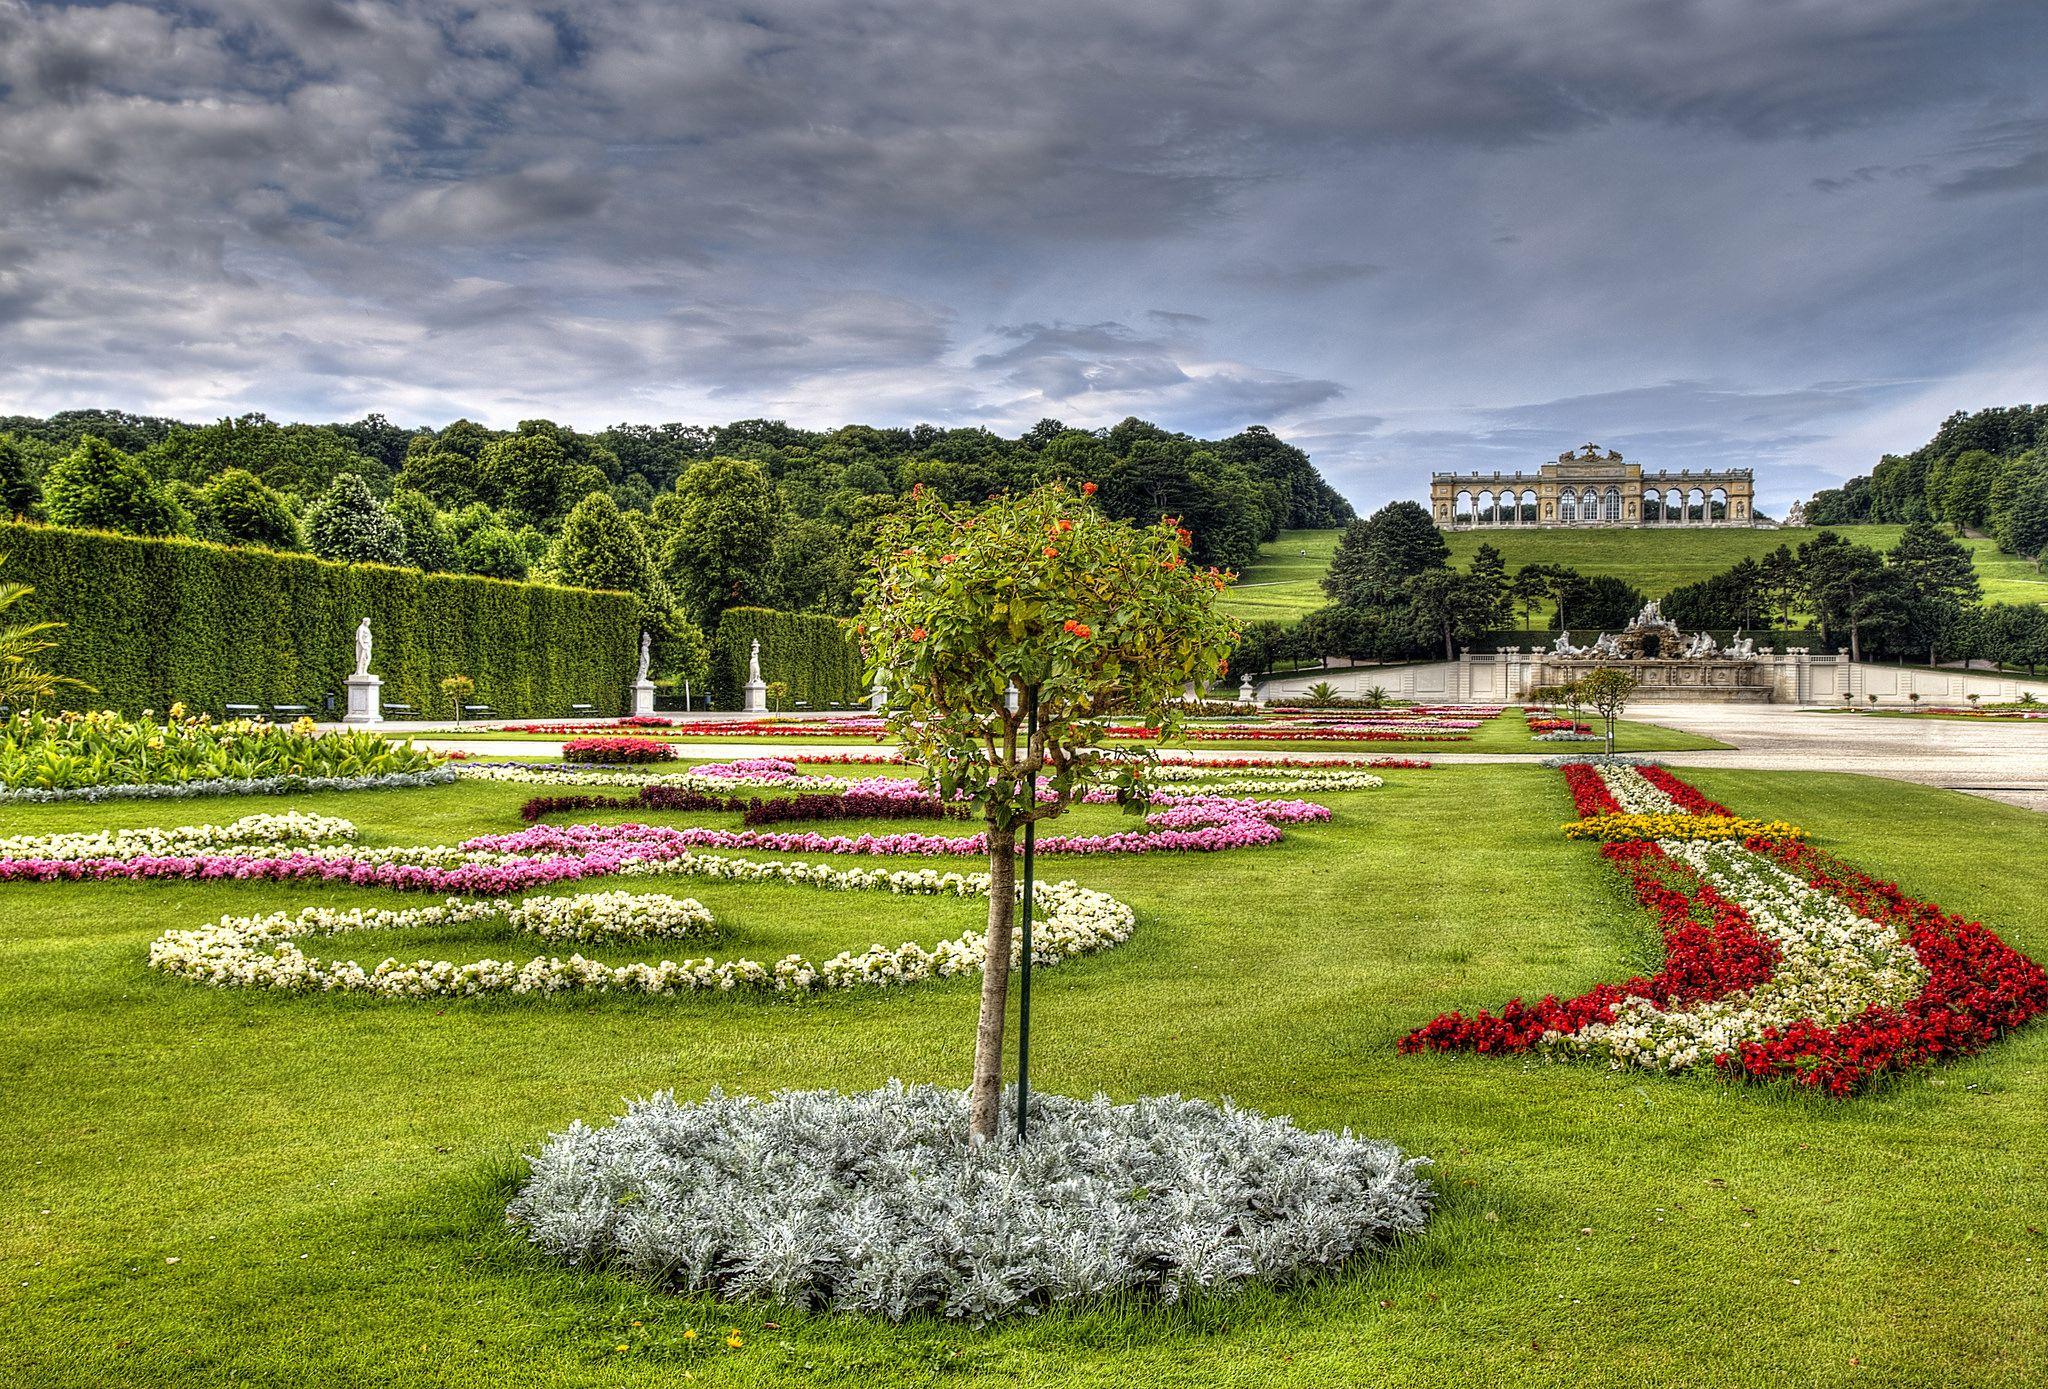 https://flic.kr/p/JGKCp7 | Schönbrunn Palace Gardens